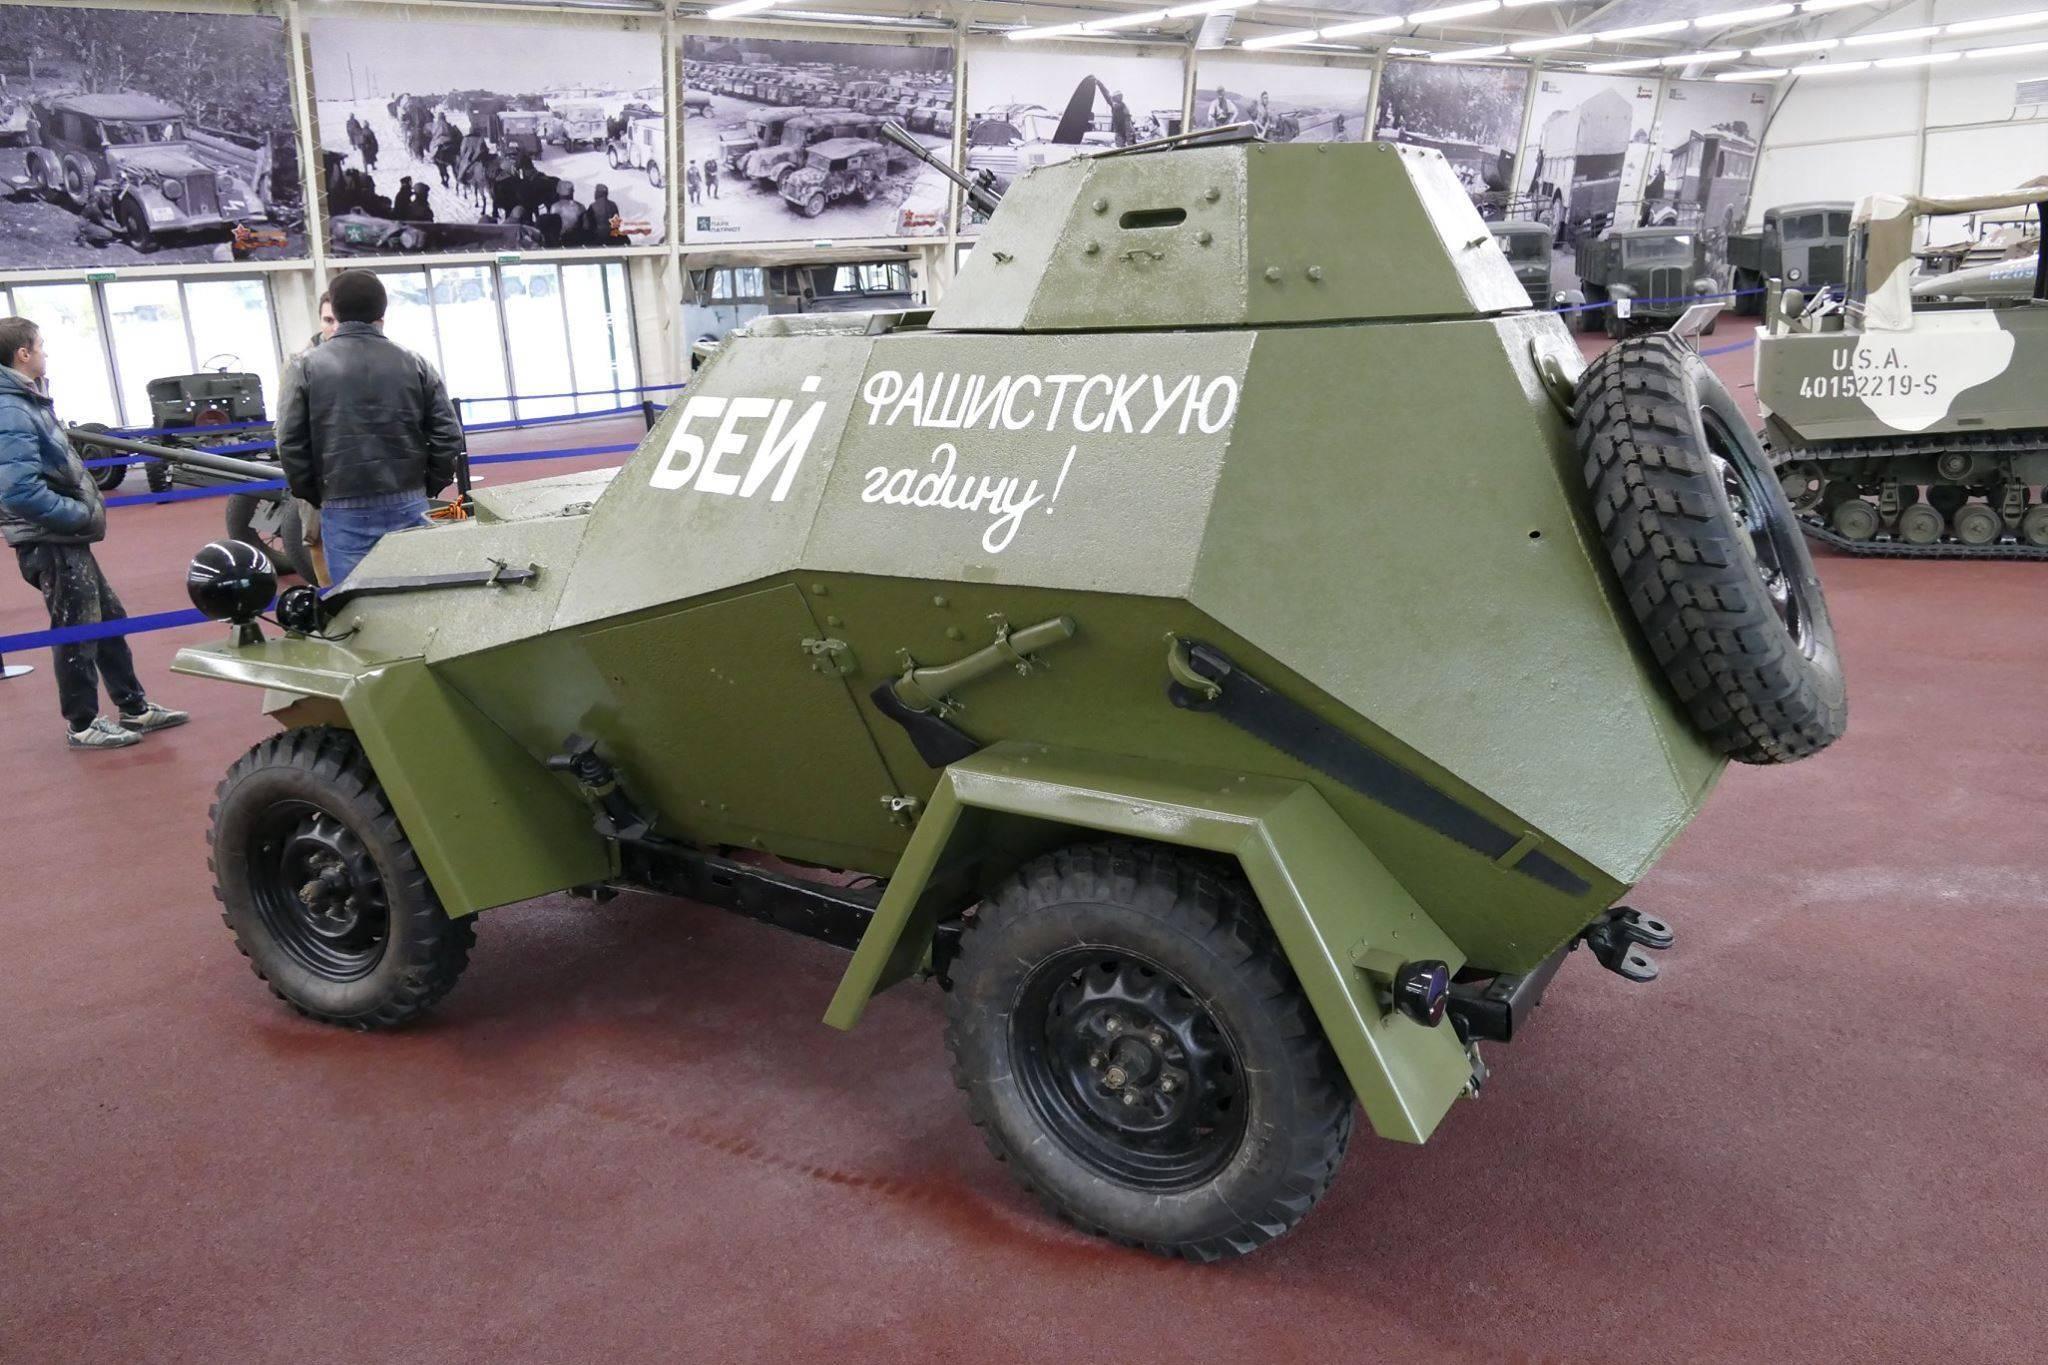 Легкий бронеавтомобиль ба-20